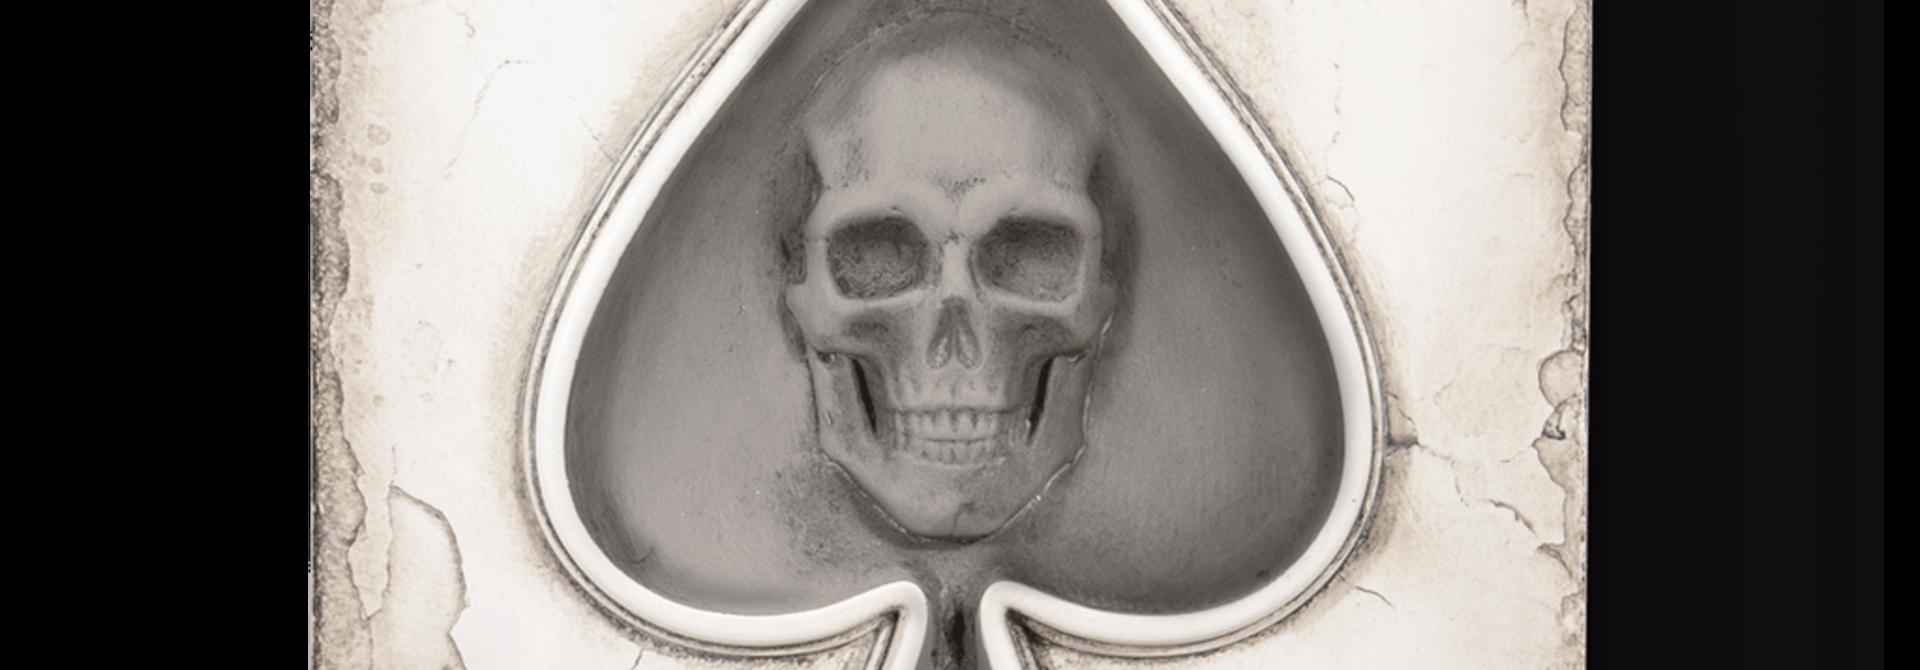 SID DICKENS - Skull As Frame